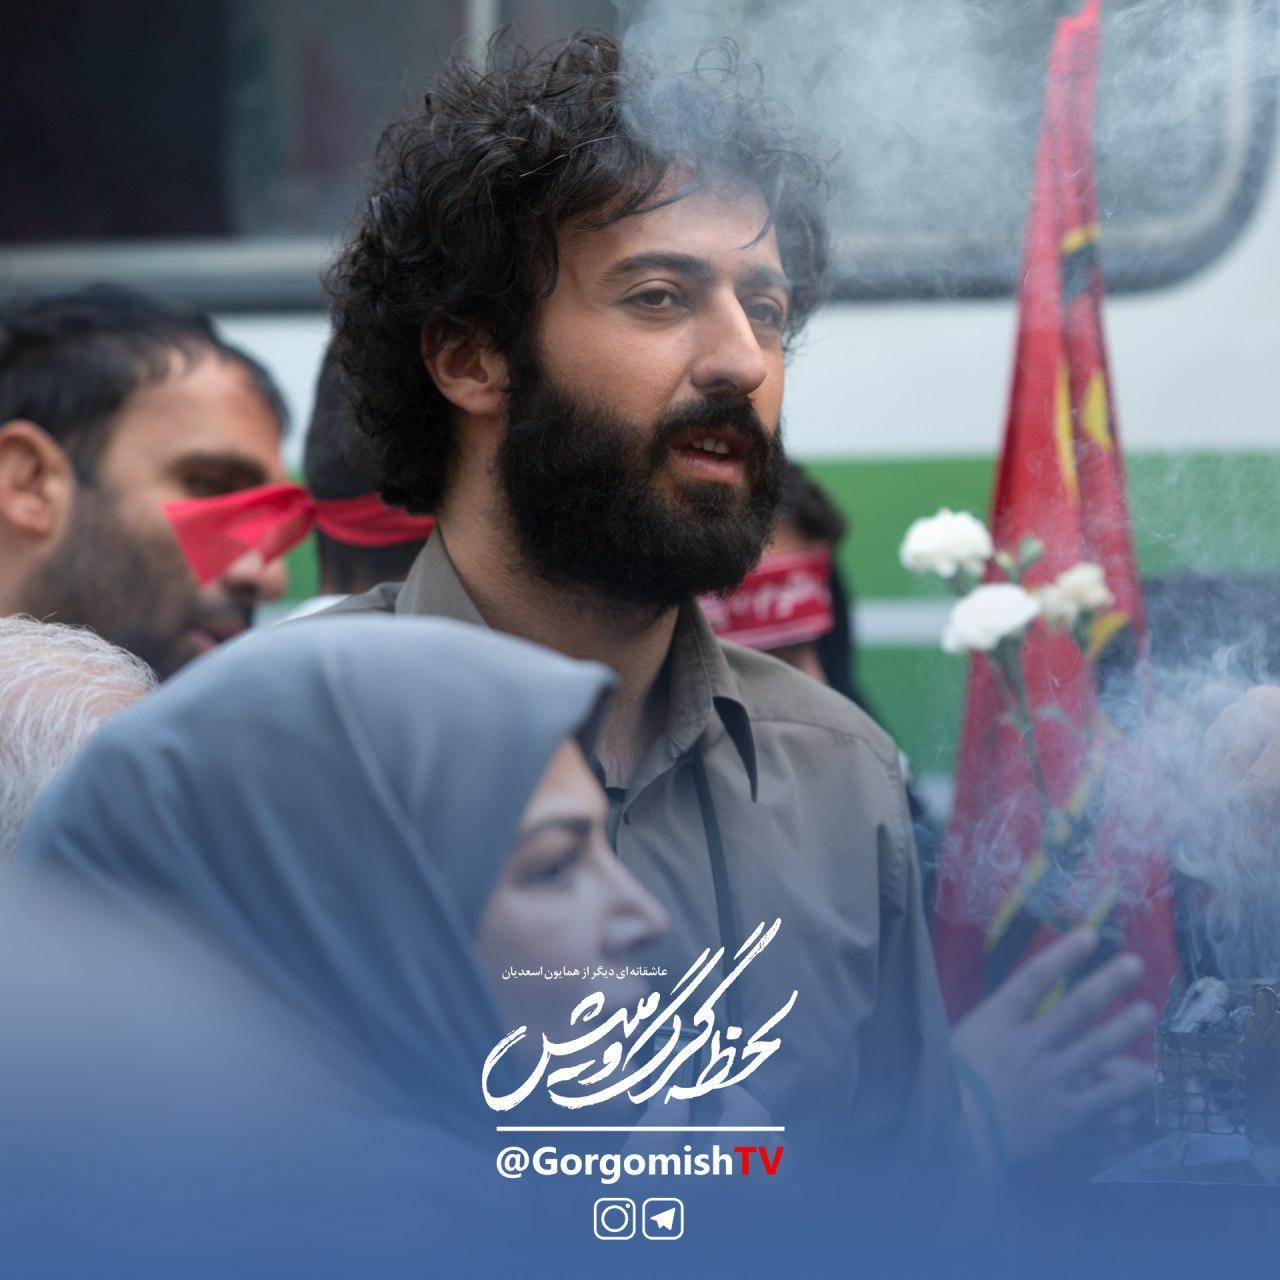 حسام محمودیفرید در صحنه سریال تلویزیونی لحظه گرگ و میش